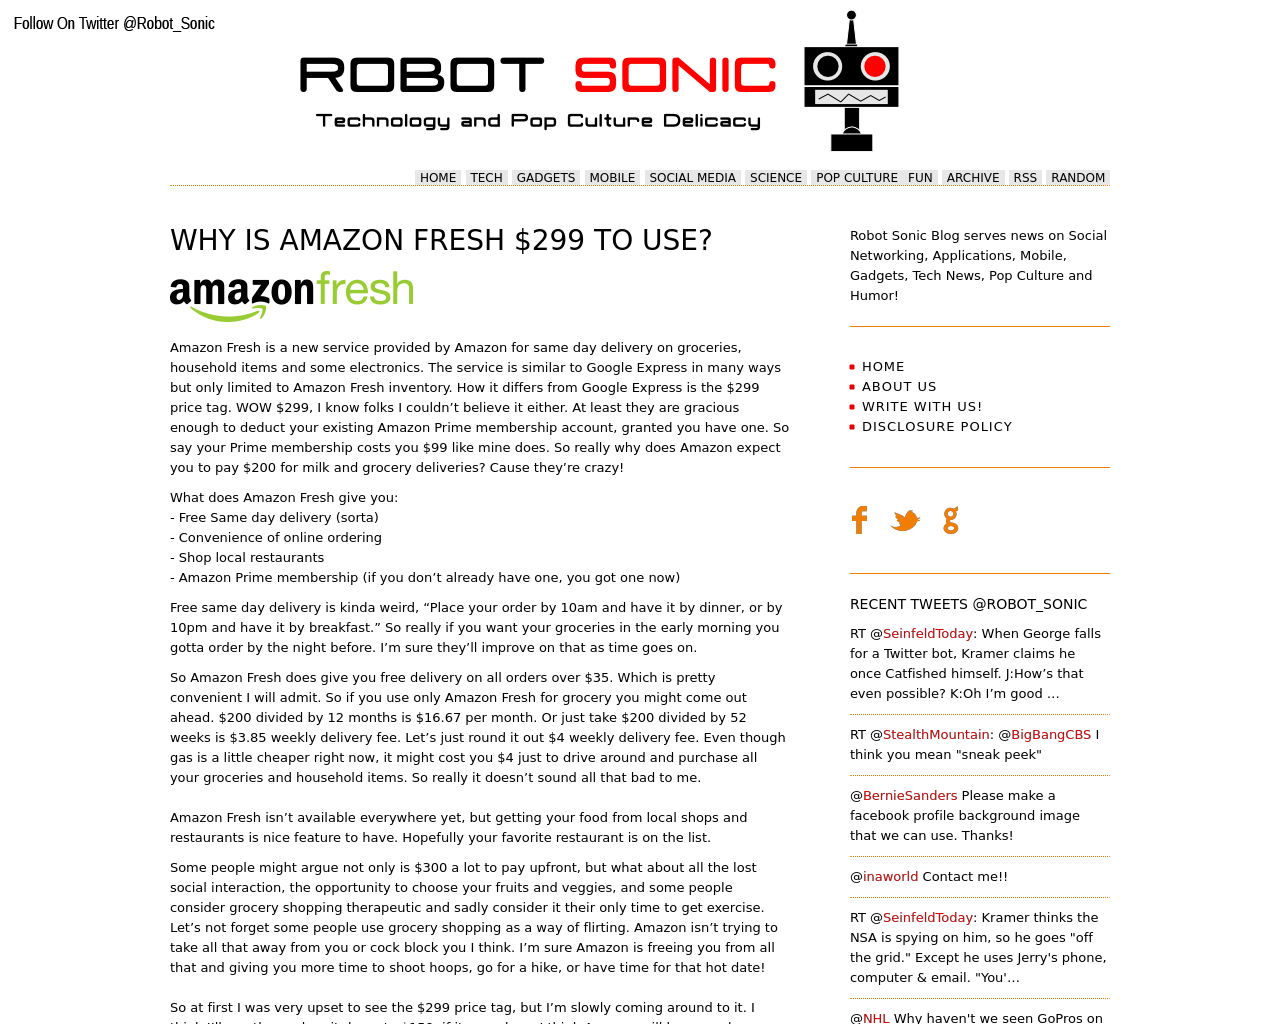 Robot-Sonic-Advertising-Reviews-Pricing